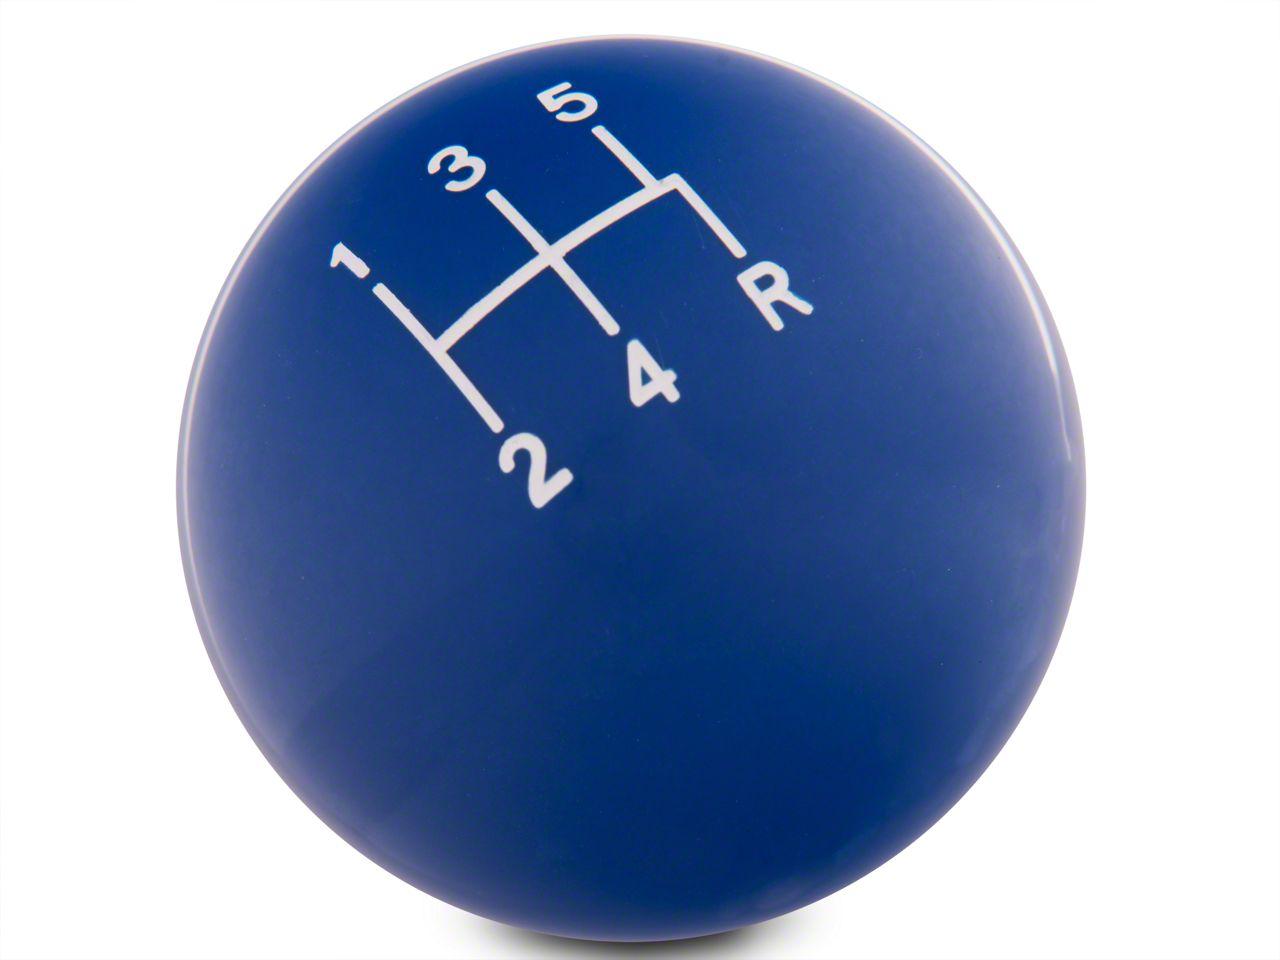 Modern Billet Retro Style 5-Speed Shift Knob - Blue (79-04 All, Excluding 03-04 Cobra)